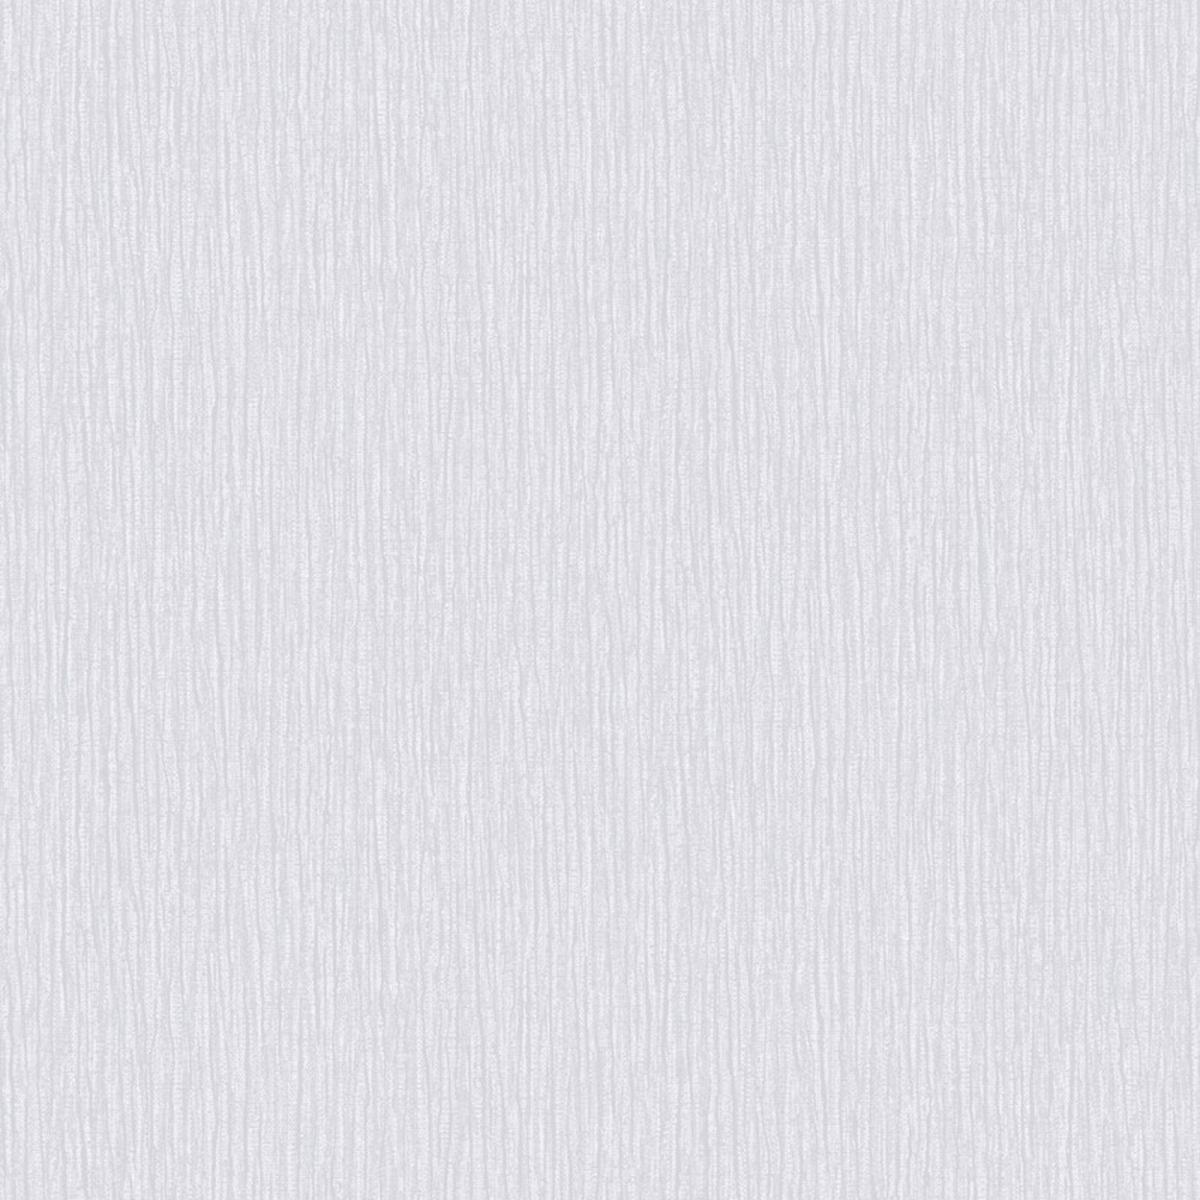 Free Download Silver Wallpaper Home Plain Silver Wallpaper